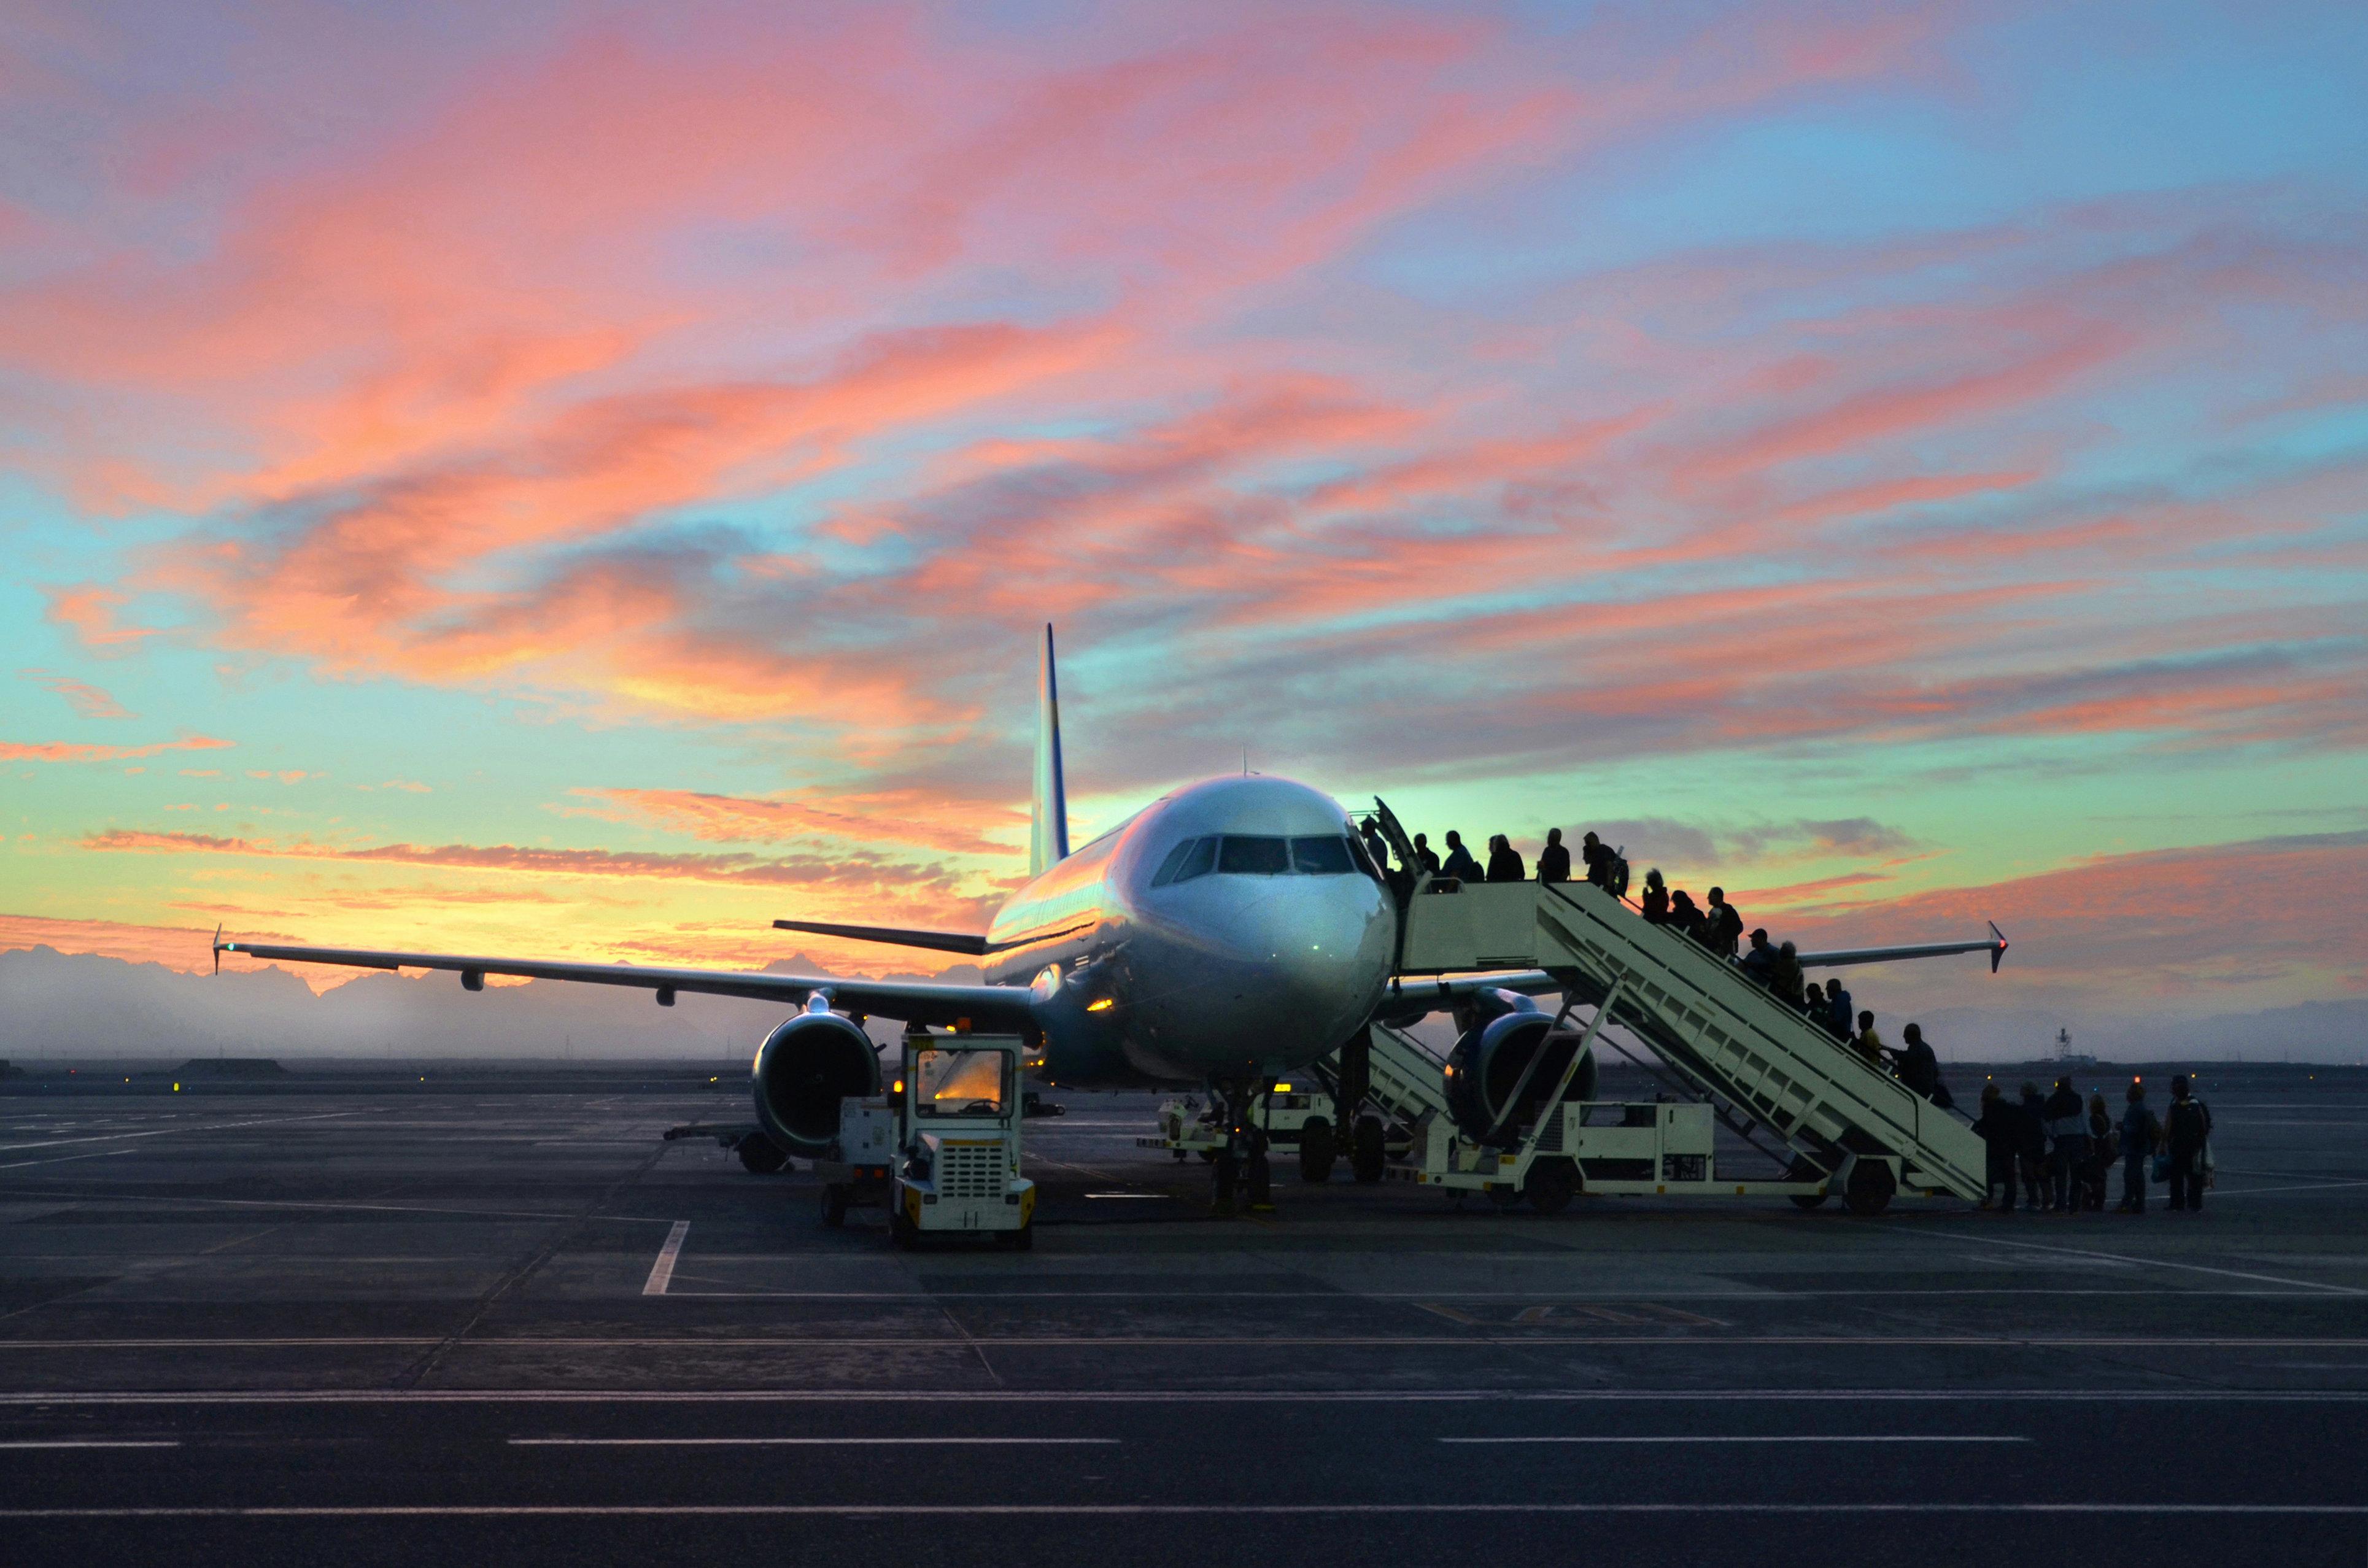 Passengers boarding a plane at sunset